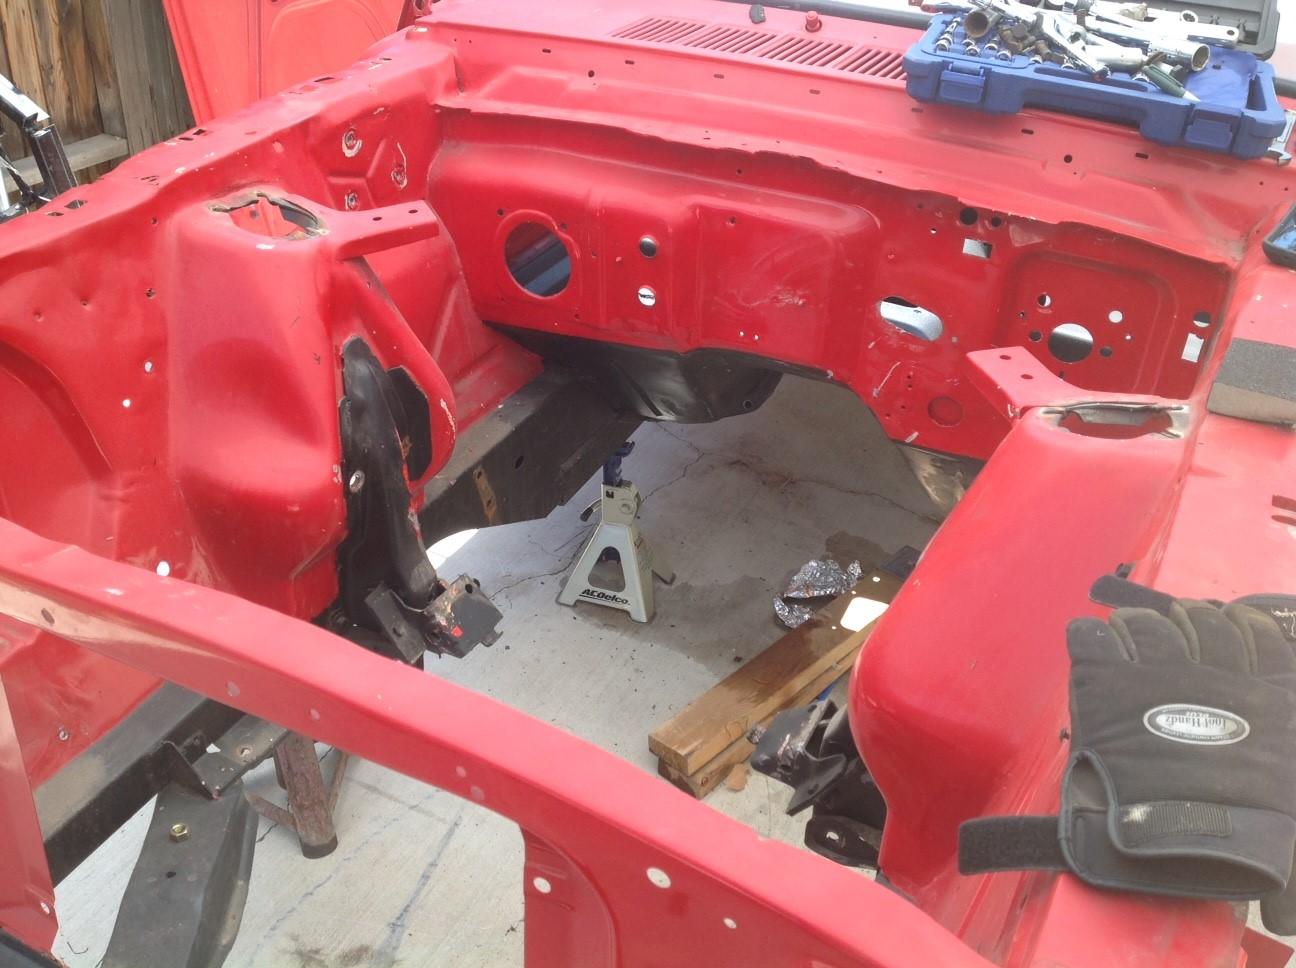 1966 Ford Mustang frame before restoration